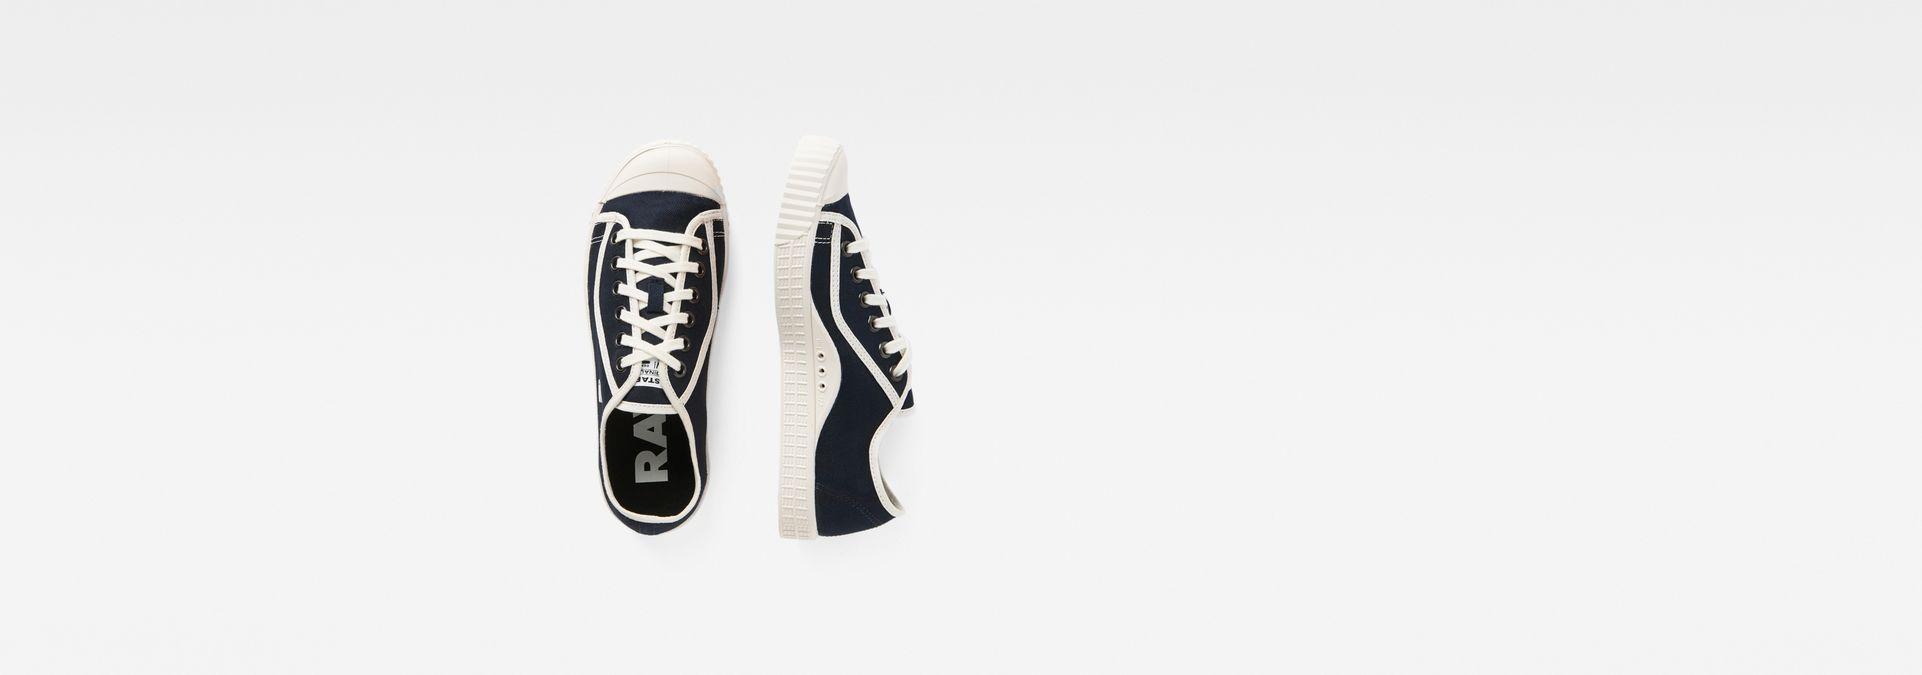 Rovulc Denim Sneakers   Dark Navy   Men   G-Star RAW®